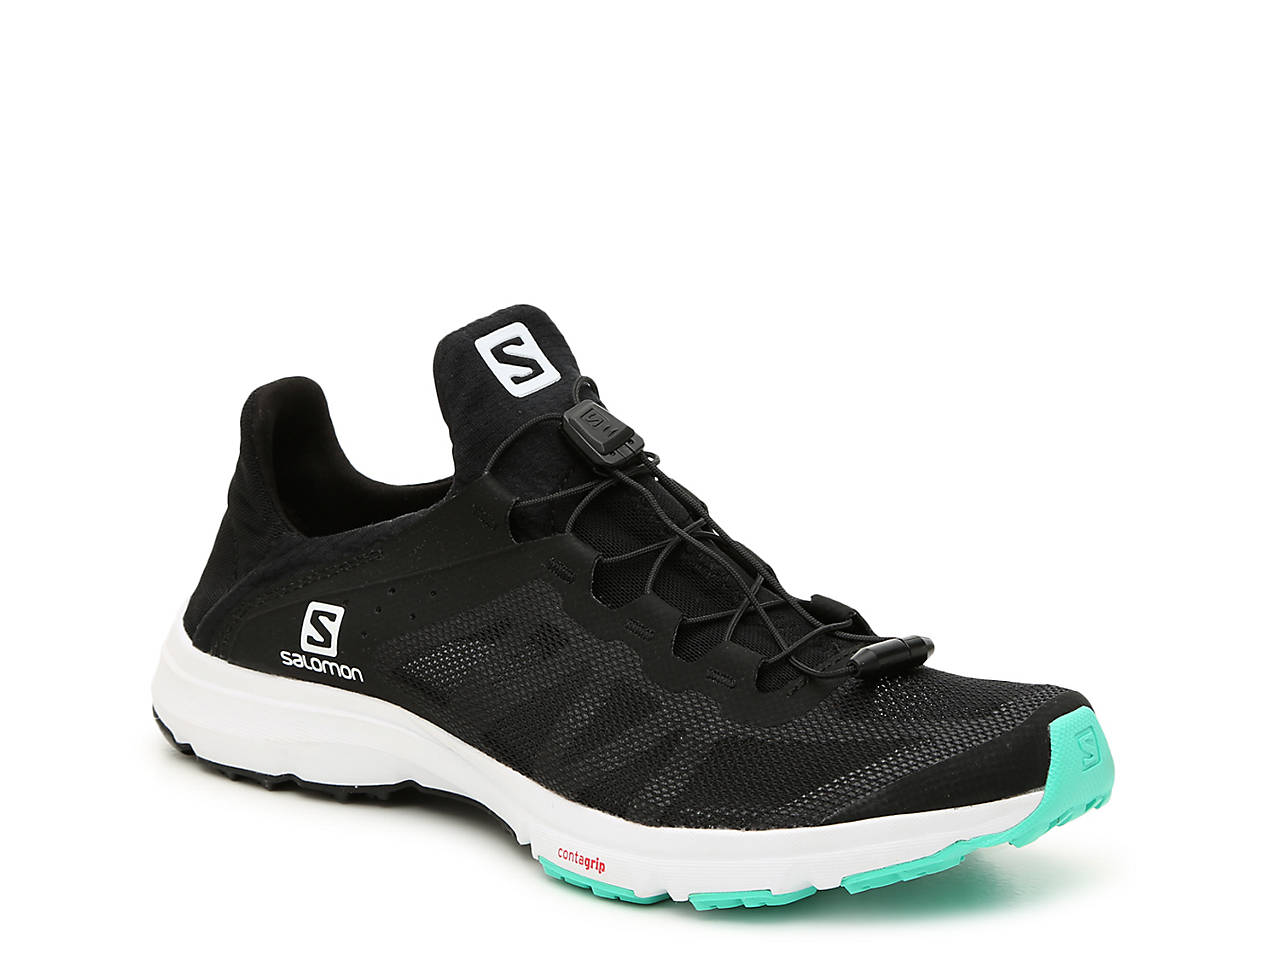 31d690c36f3b Salomon Amphib Bold Water Shoe Women s Shoes